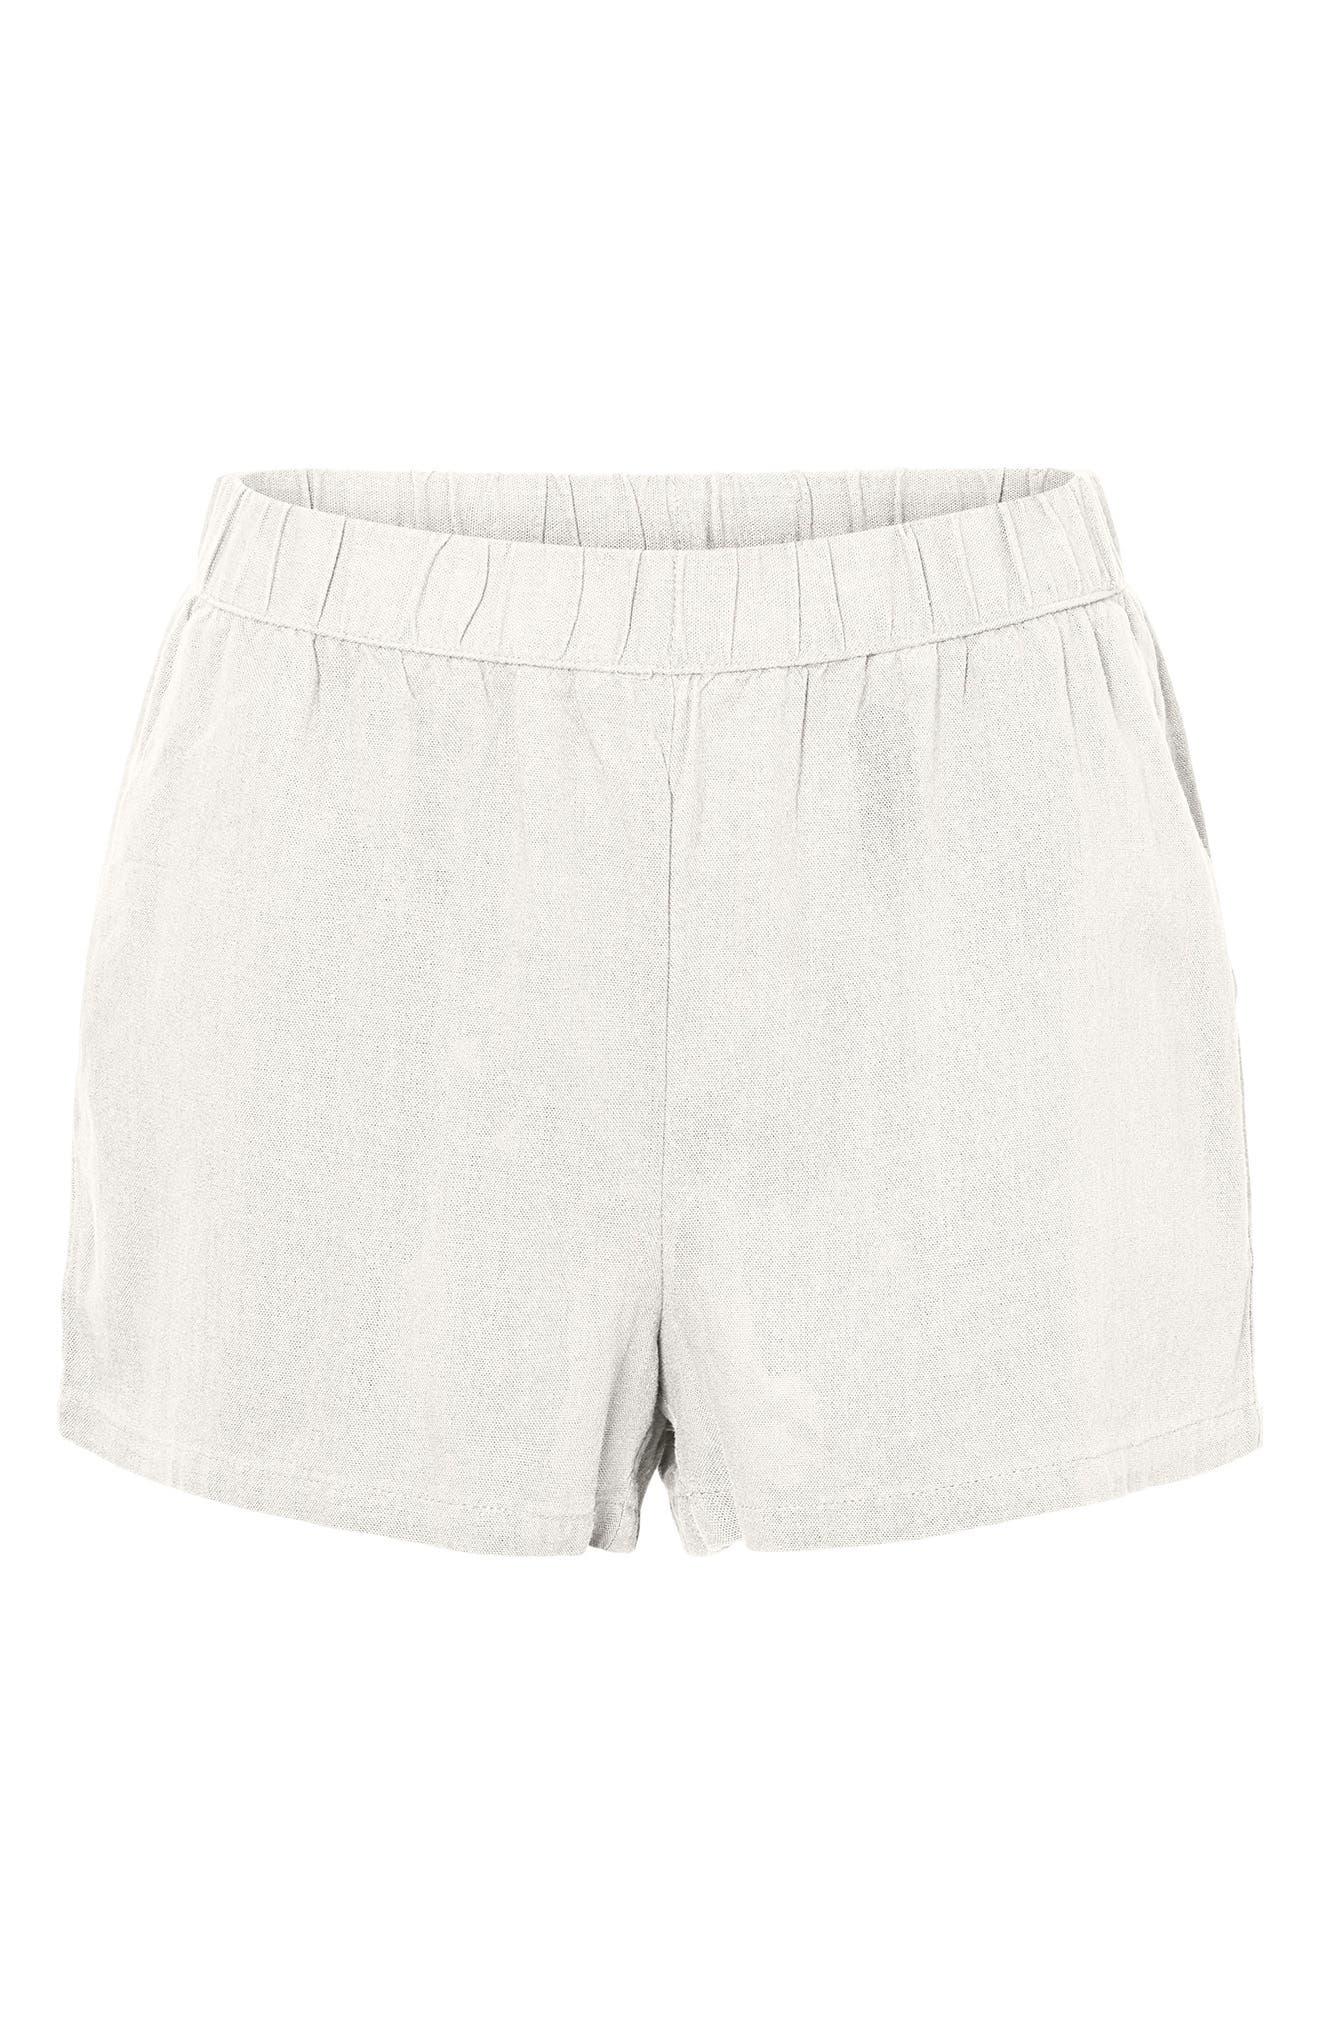 Women's Vero Moda Helen Shorts,  Large - White